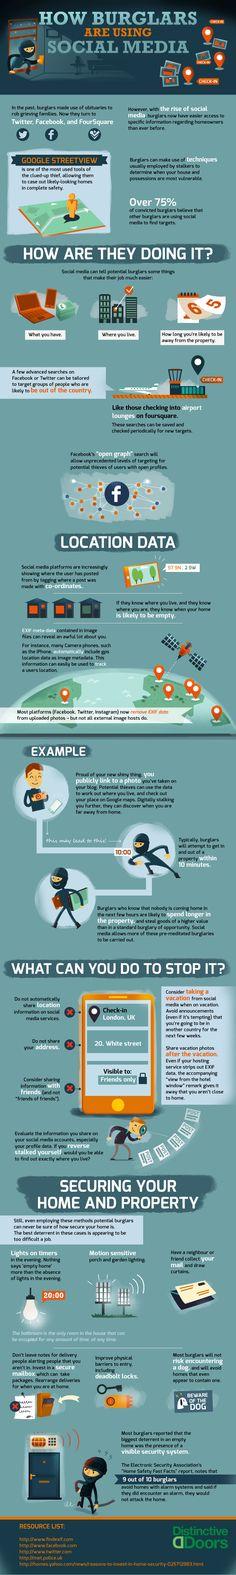 How Burglars are Using #SocialMedia